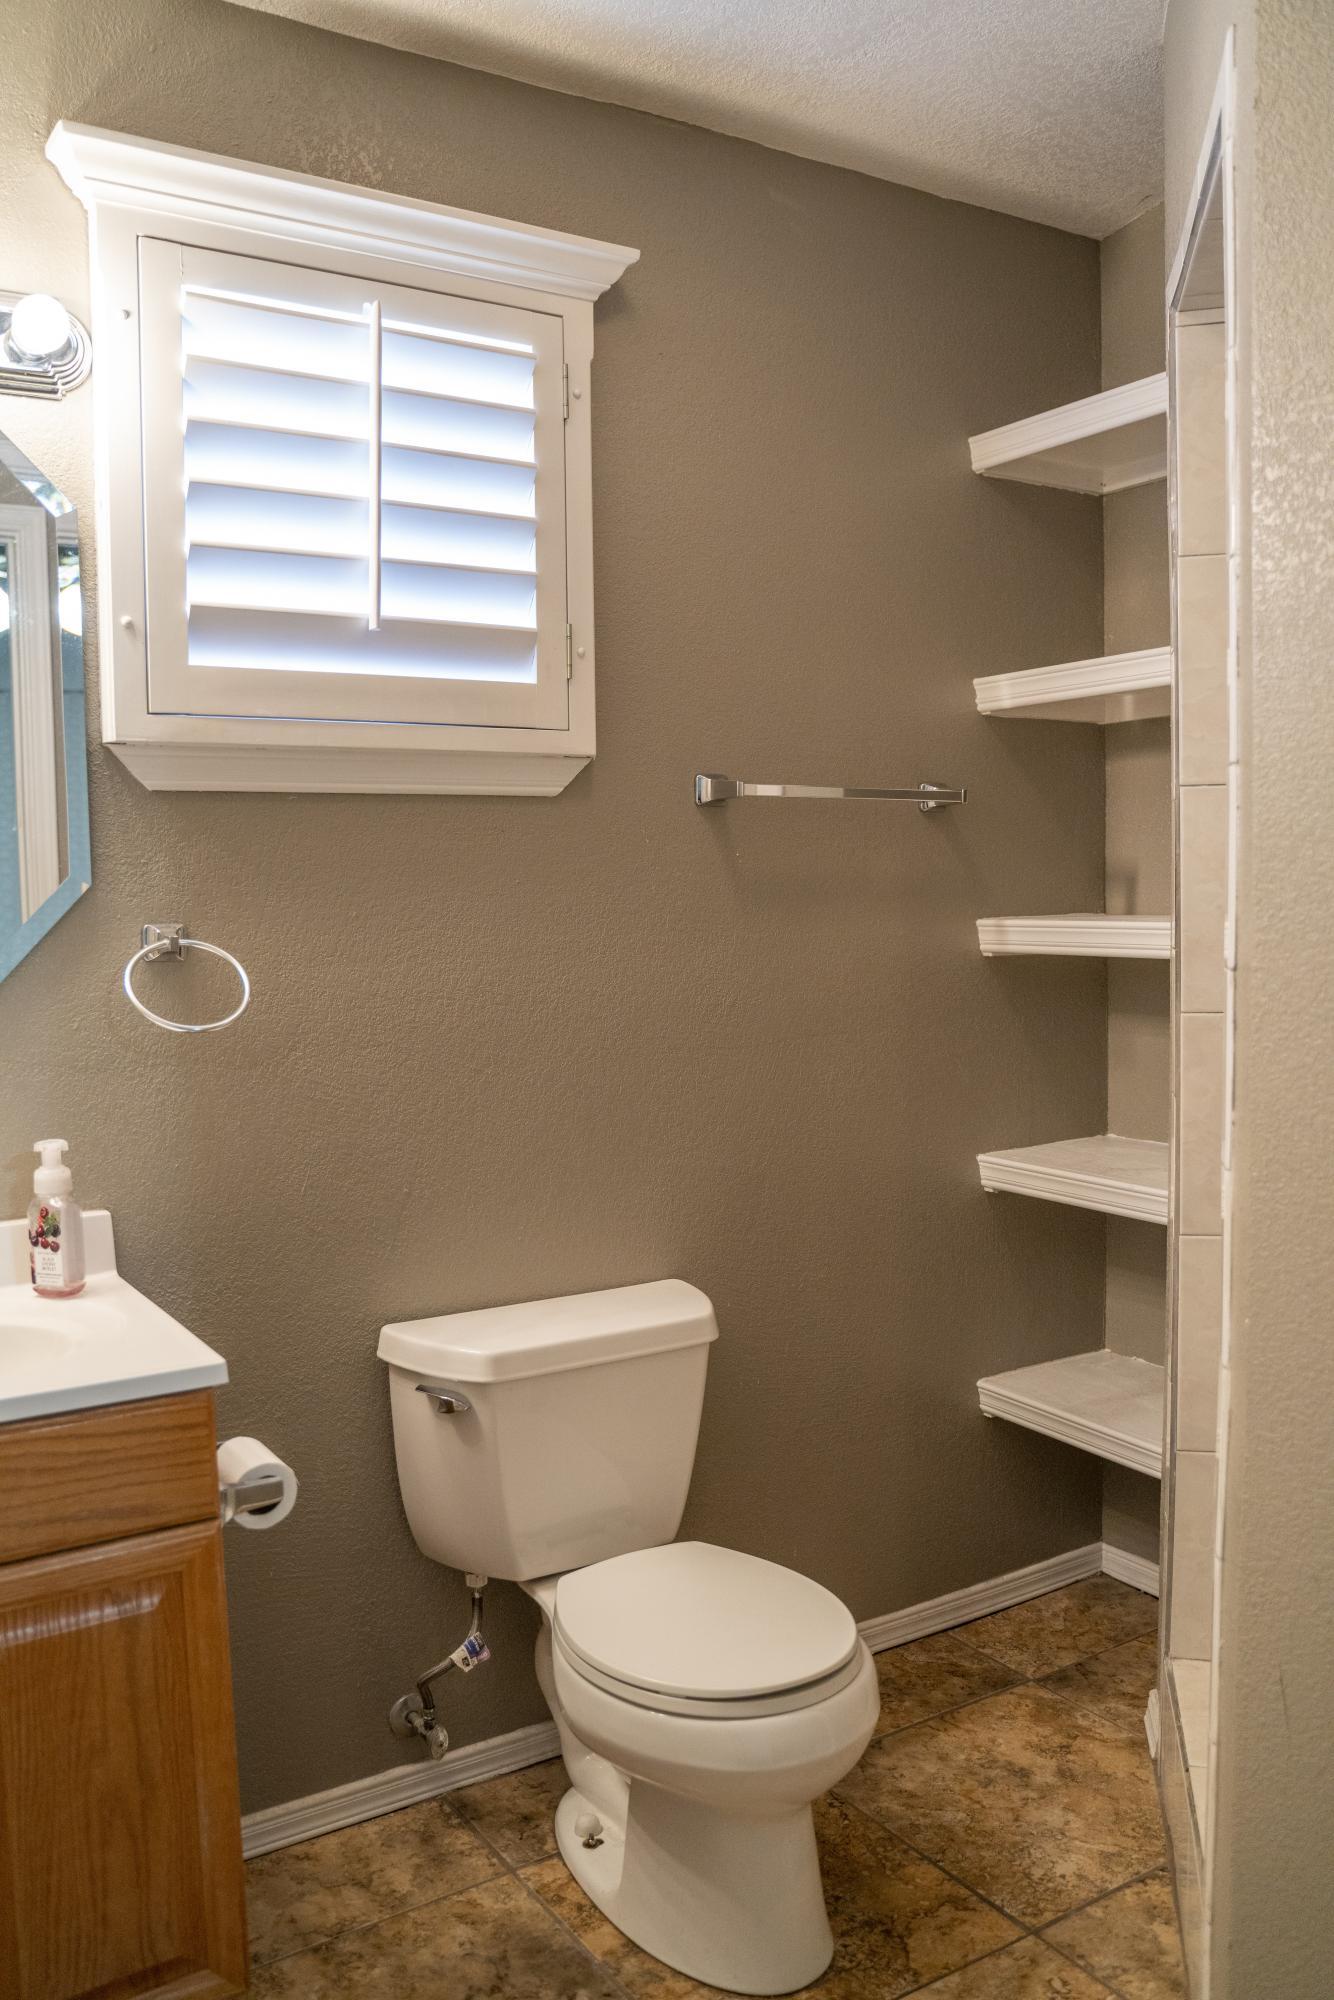 712 Cent master bathroom